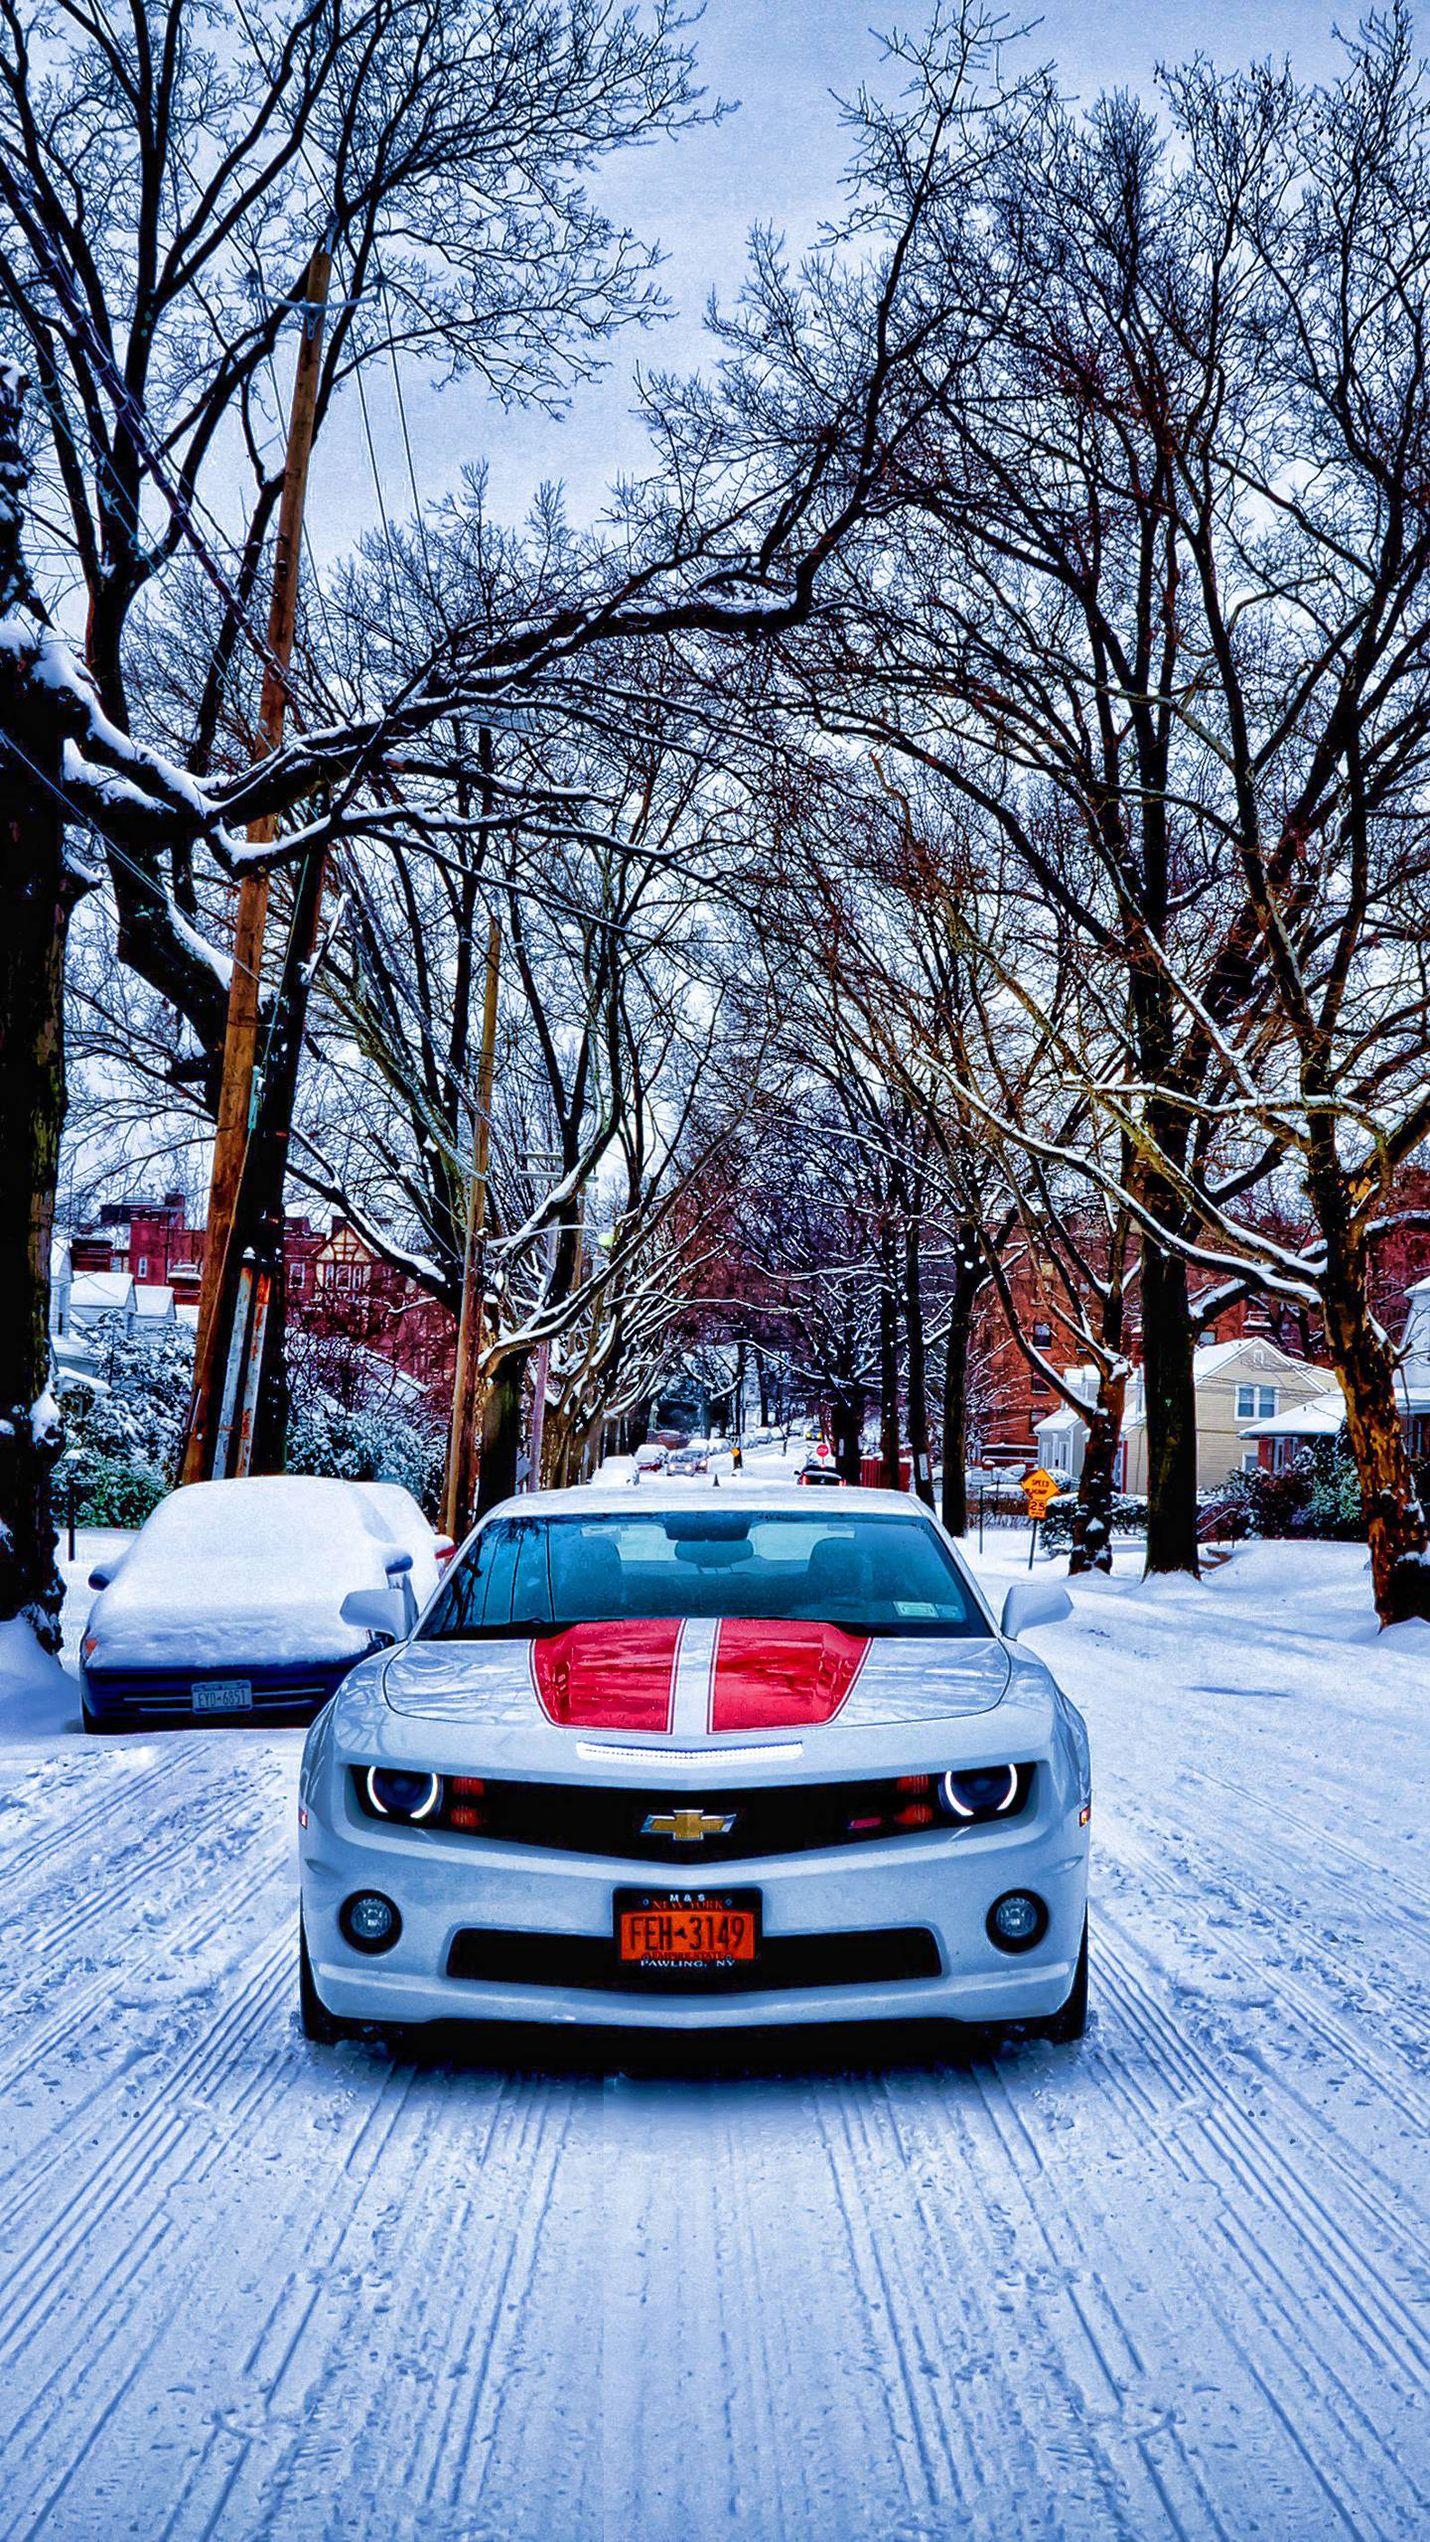 Camaro In Snow Hd Wallpaper Download In Link Camaro Car Wallpapers Sports Wallpapers